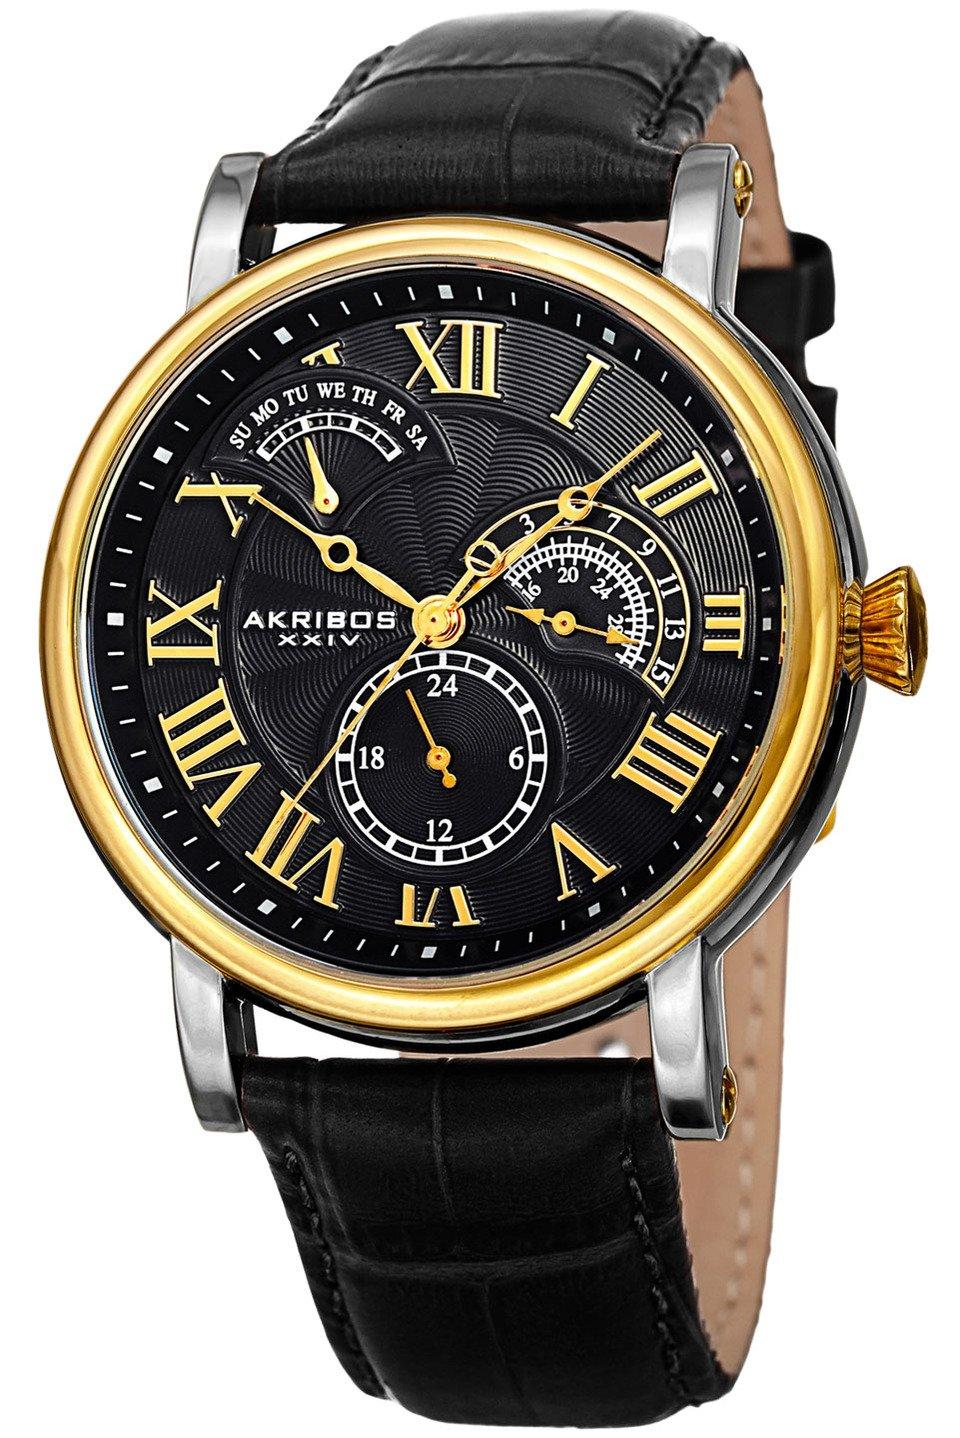 Men's Multifunction Genuine Leather Strap Watch in Black